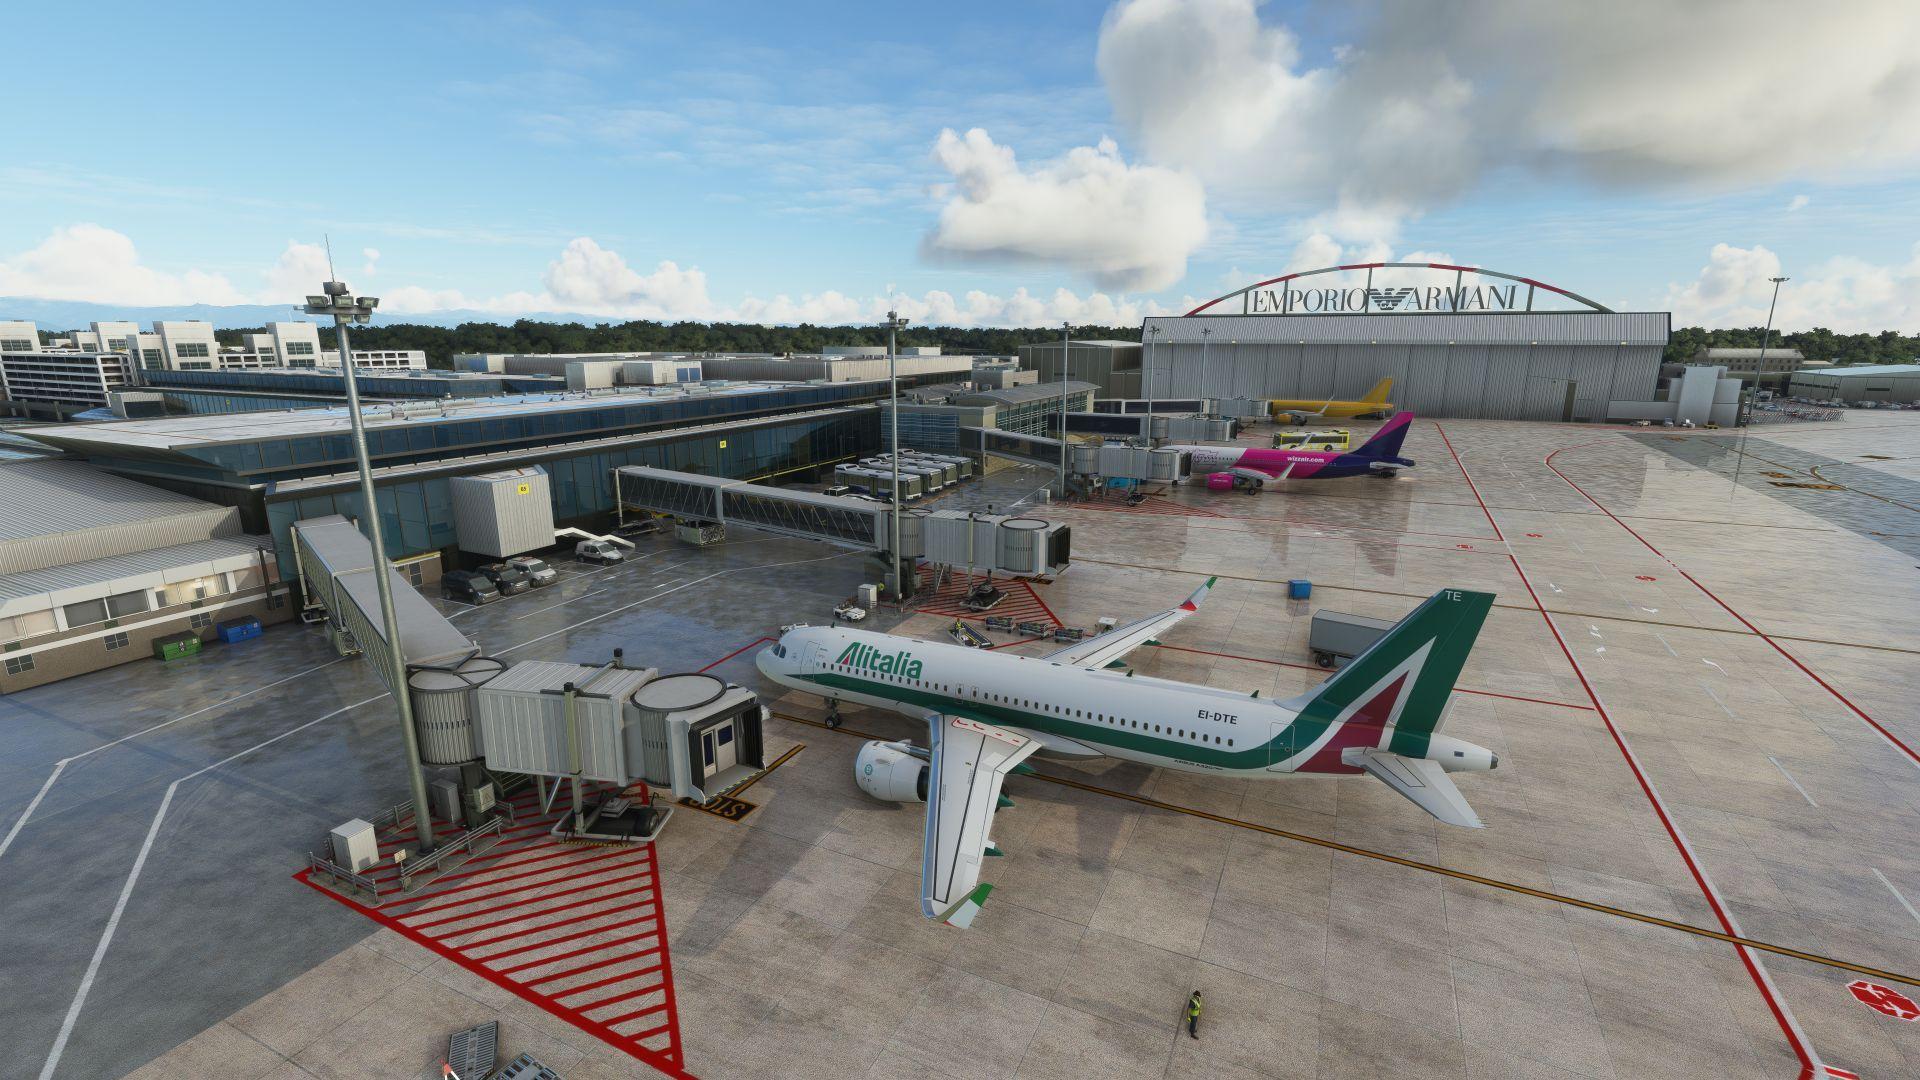 MSFS LIML Milan Linate Airport